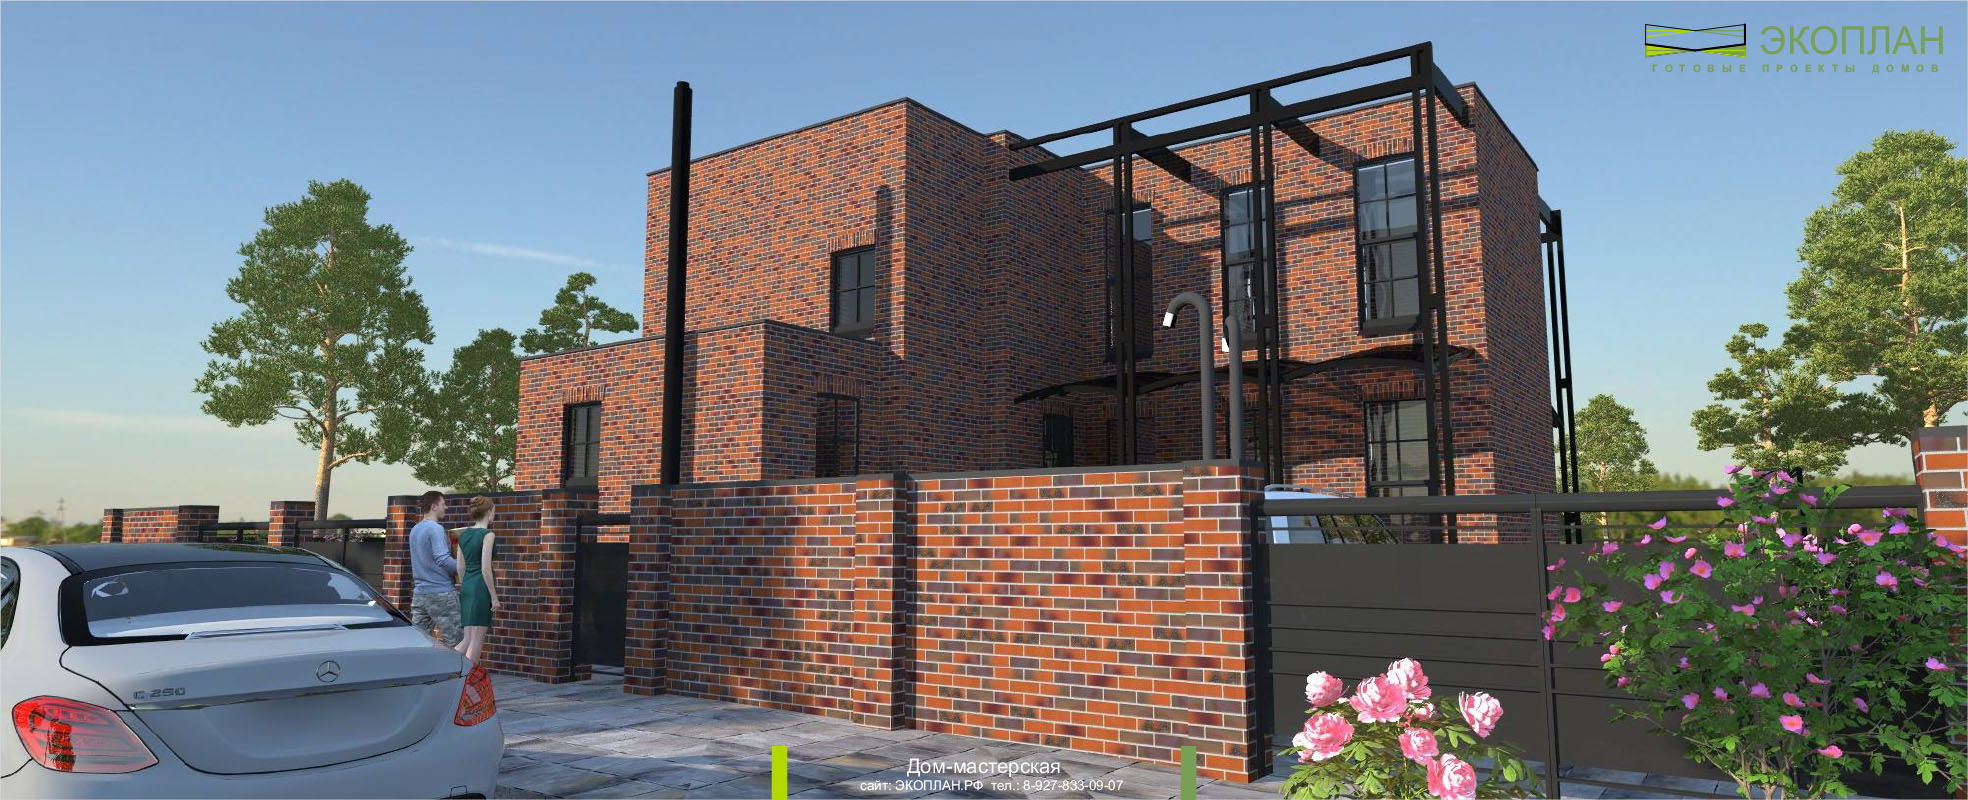 Дом-мастерская с стиле лофт фасад